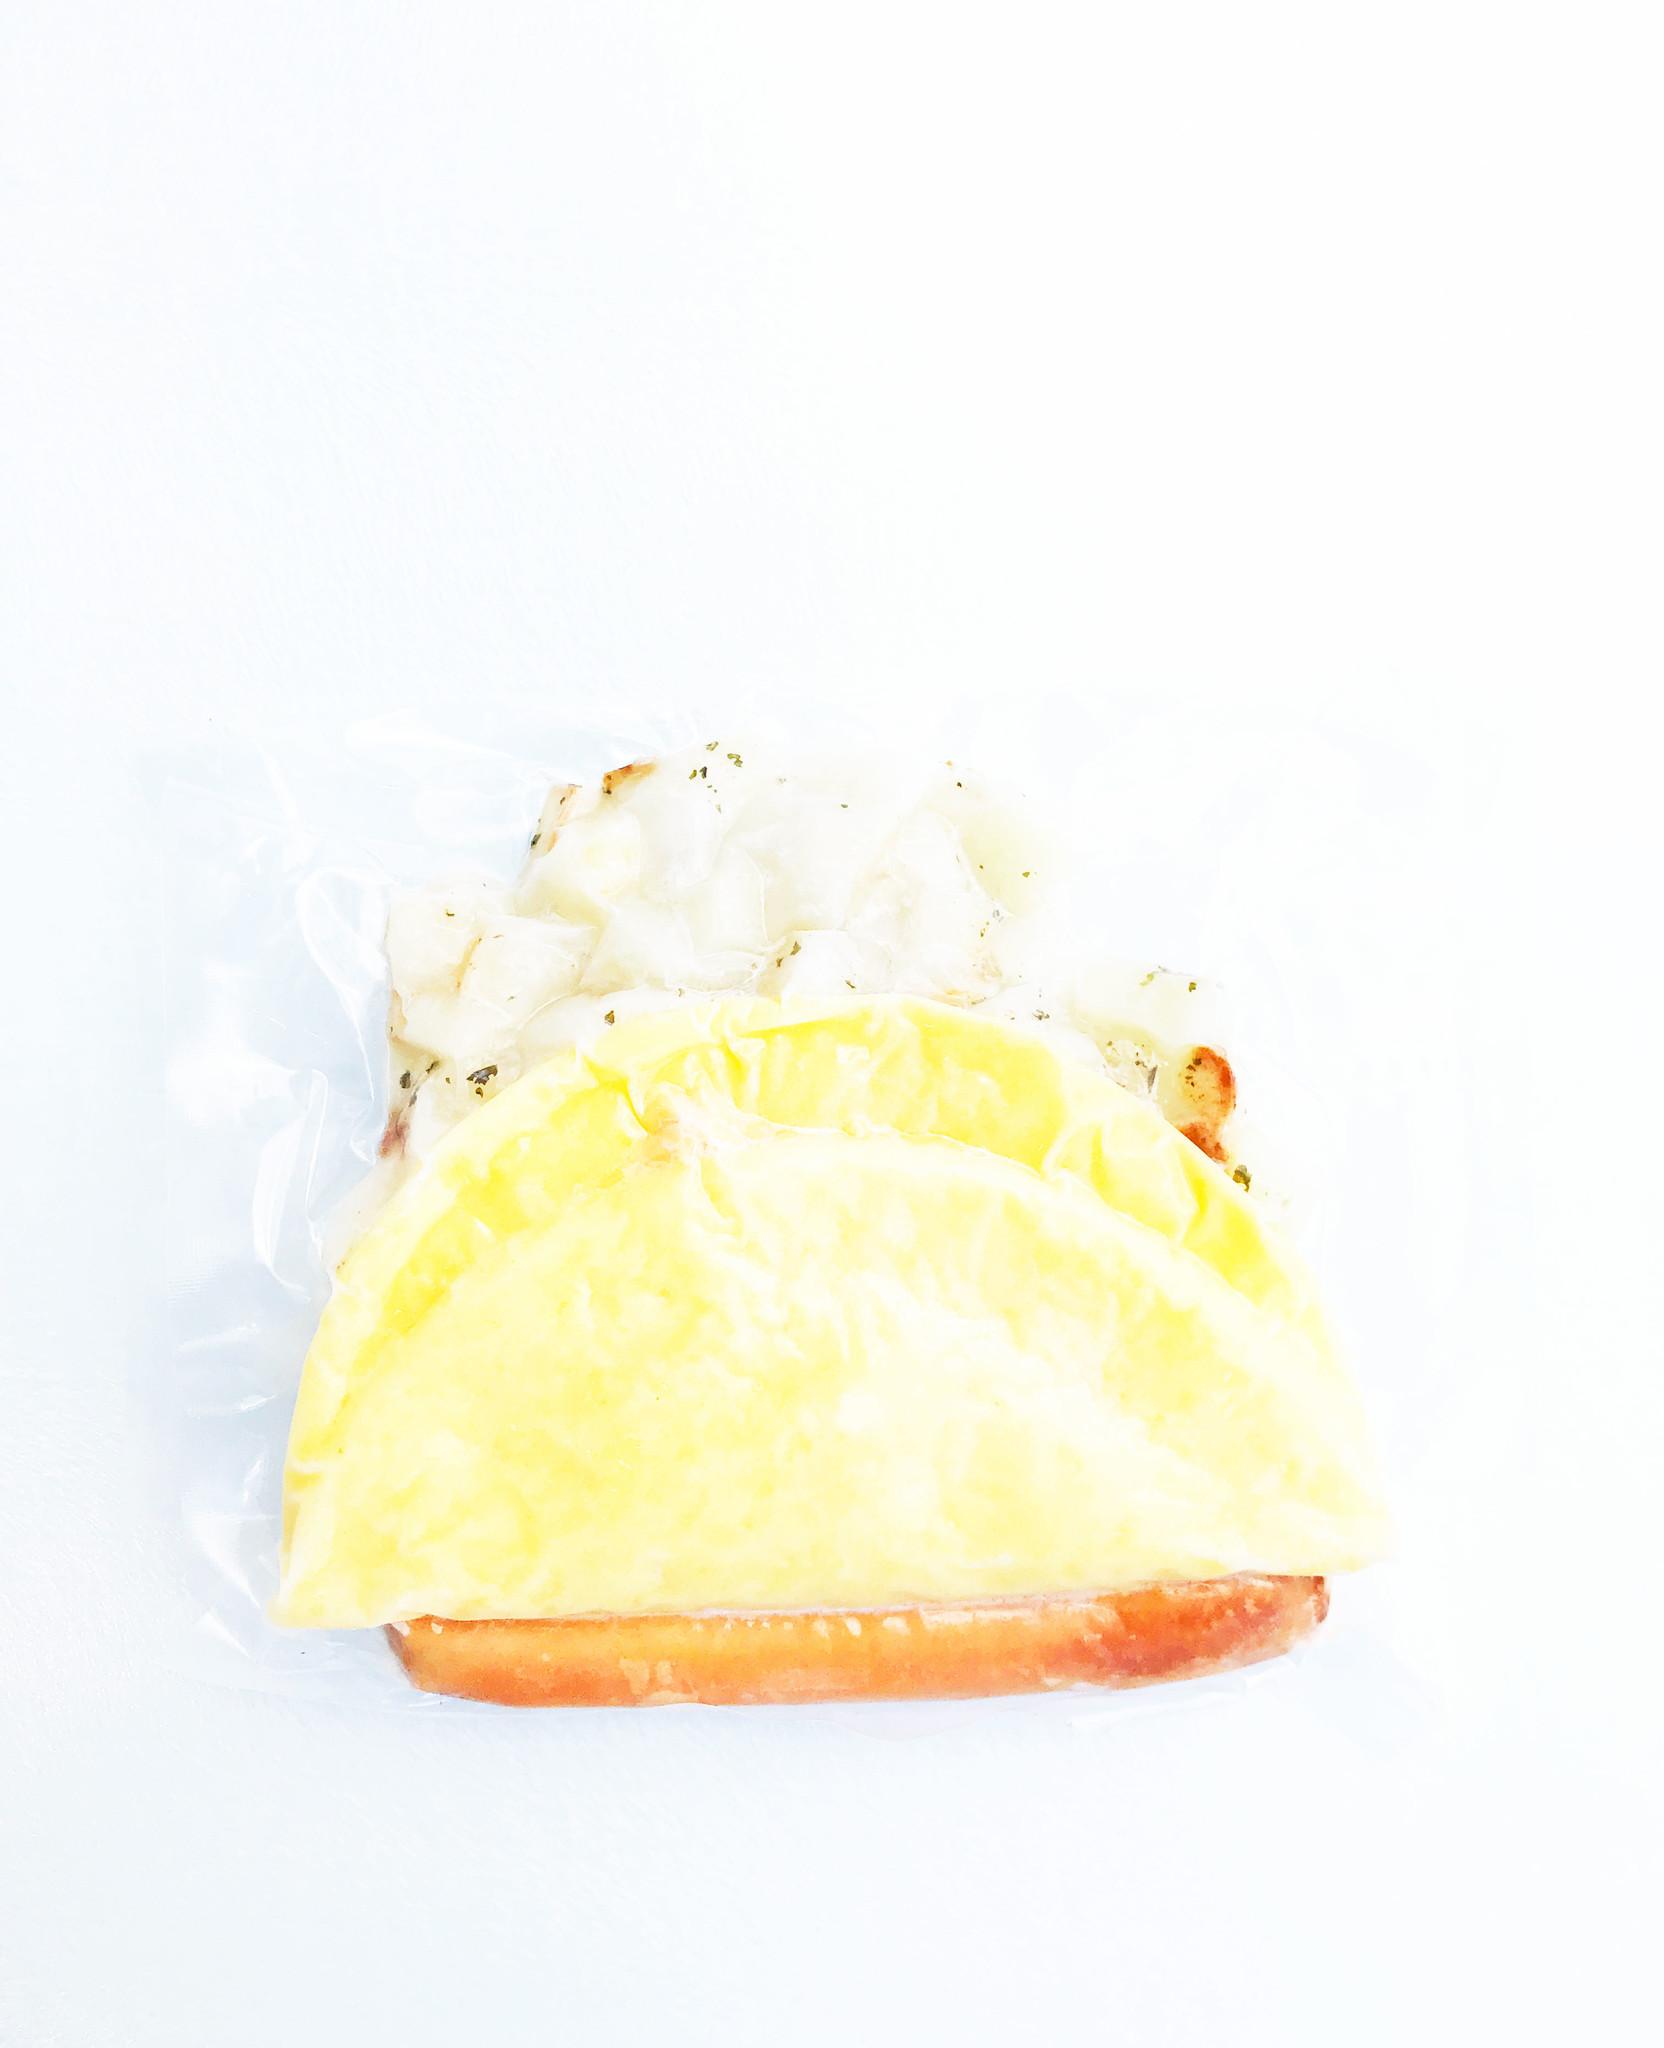 Cheese omelet, sausage & homemade potatos